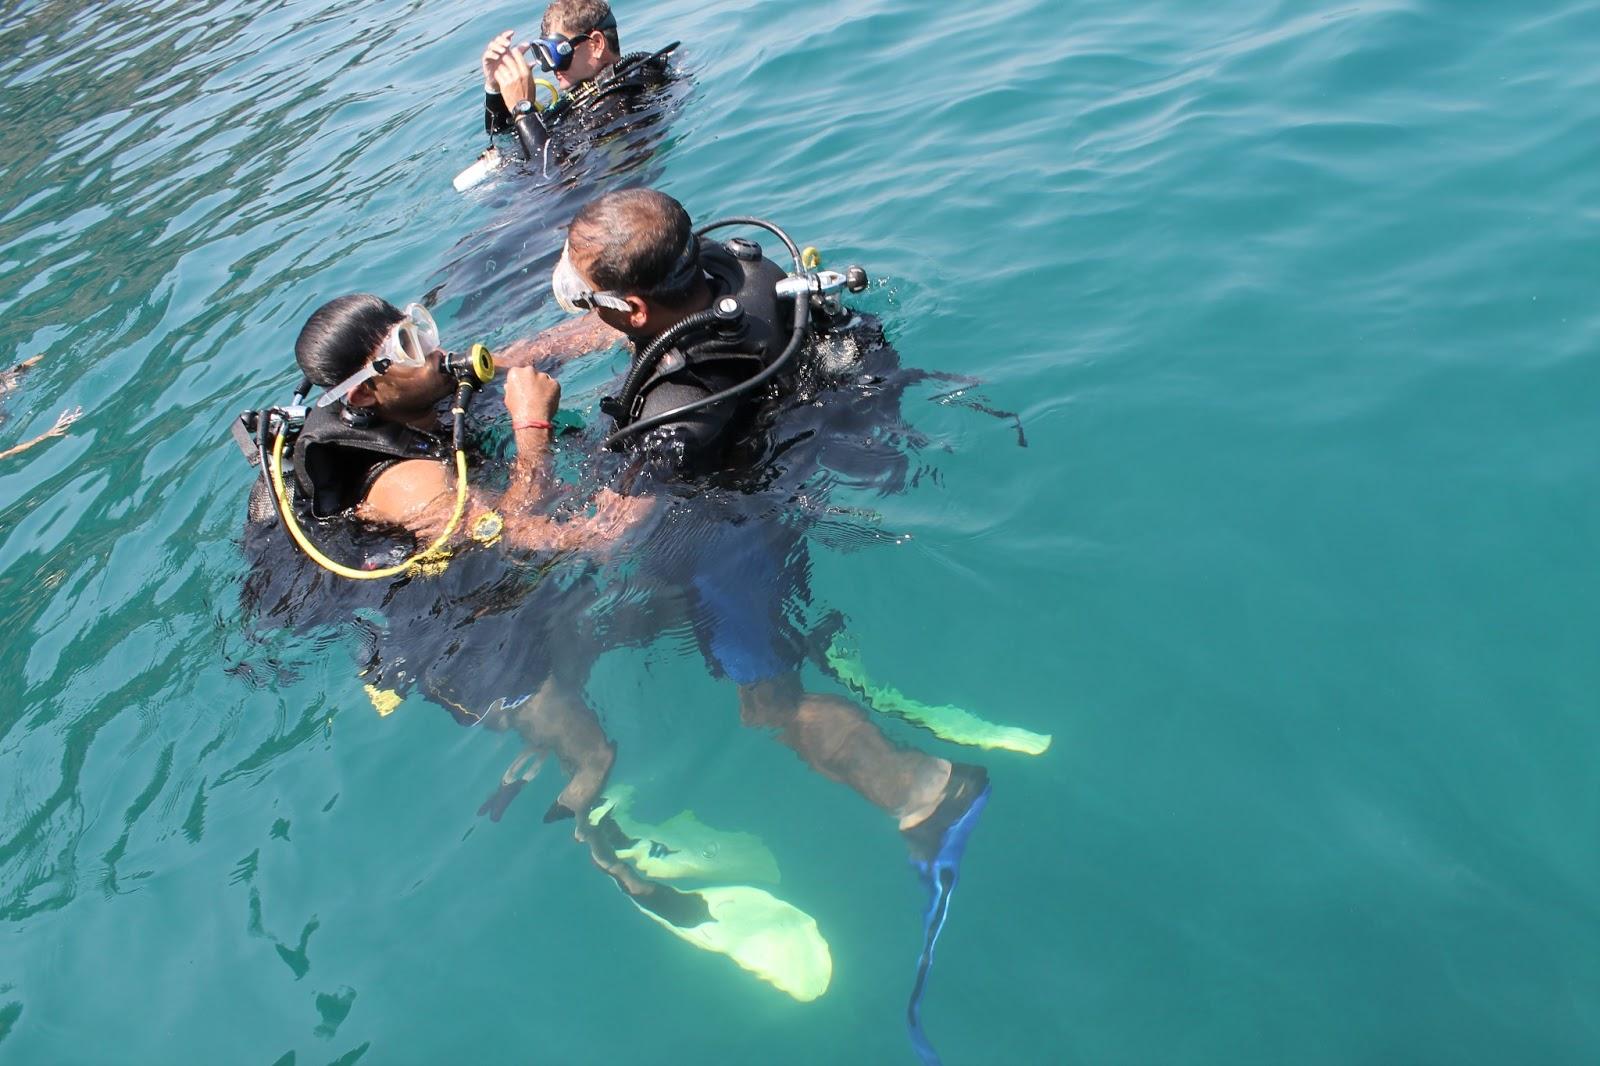 Netrani Island Scuba Diving Review